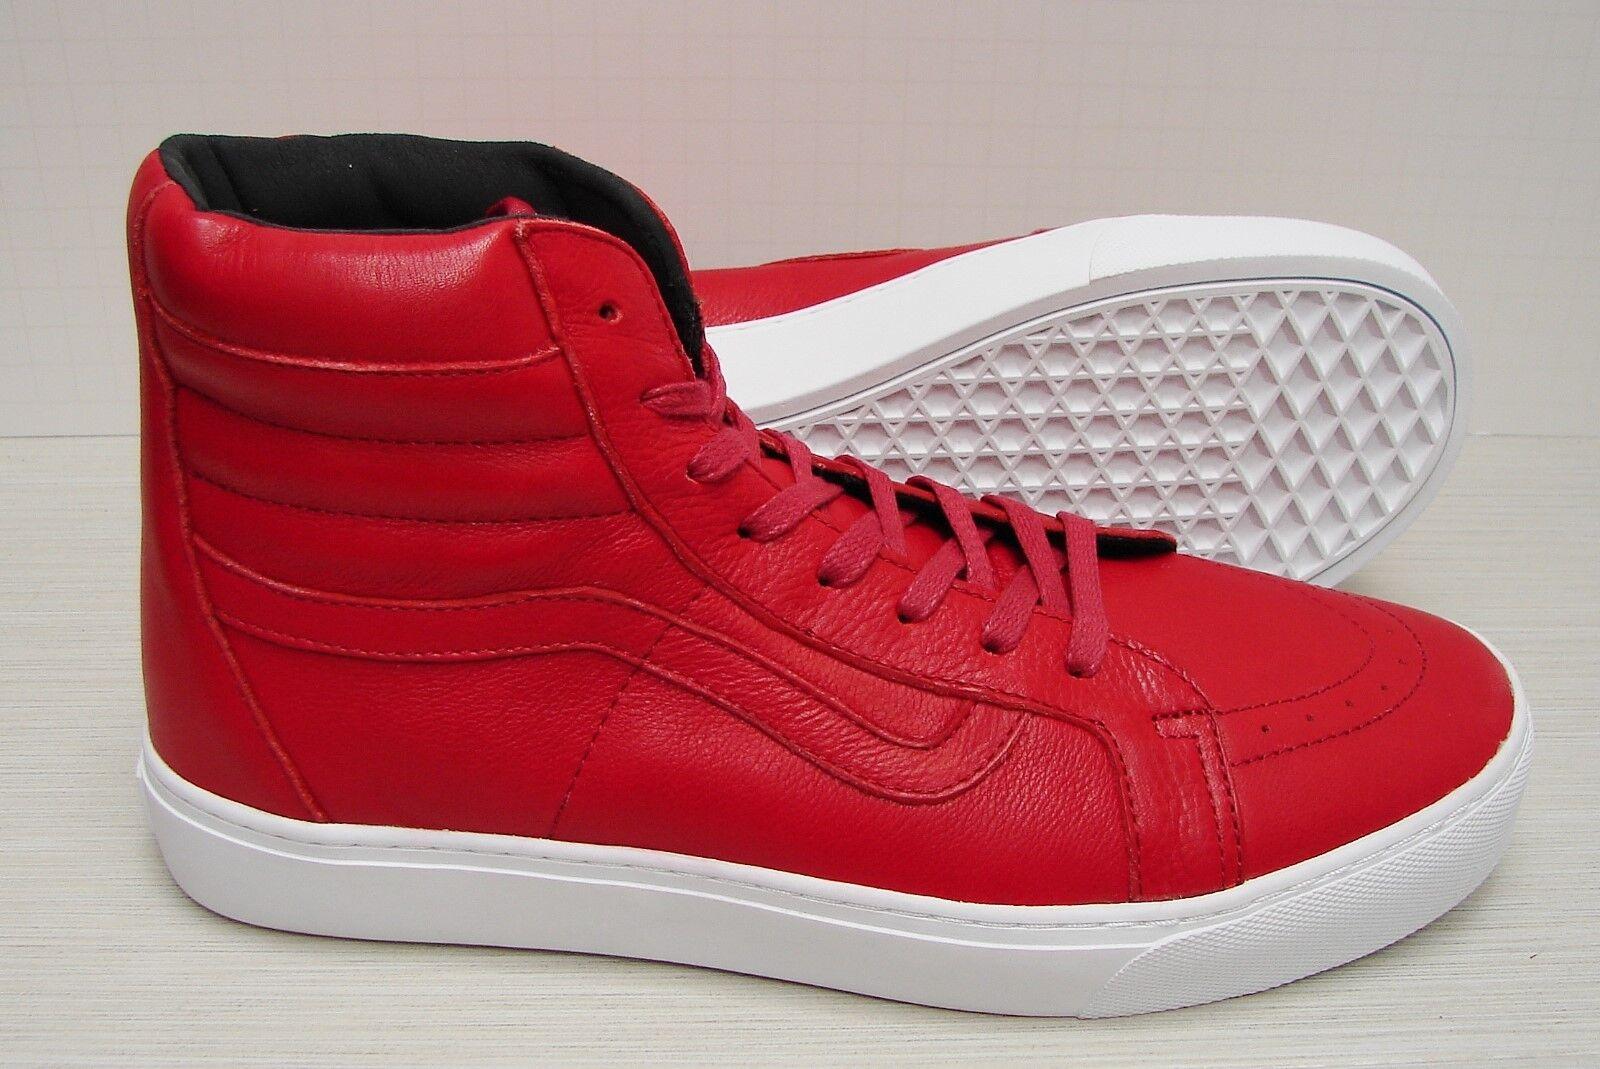 Vans SK8 Hi Cup Leather Red VN0A2Z5X1ED Men's Size Size Size 11.5 83ec17